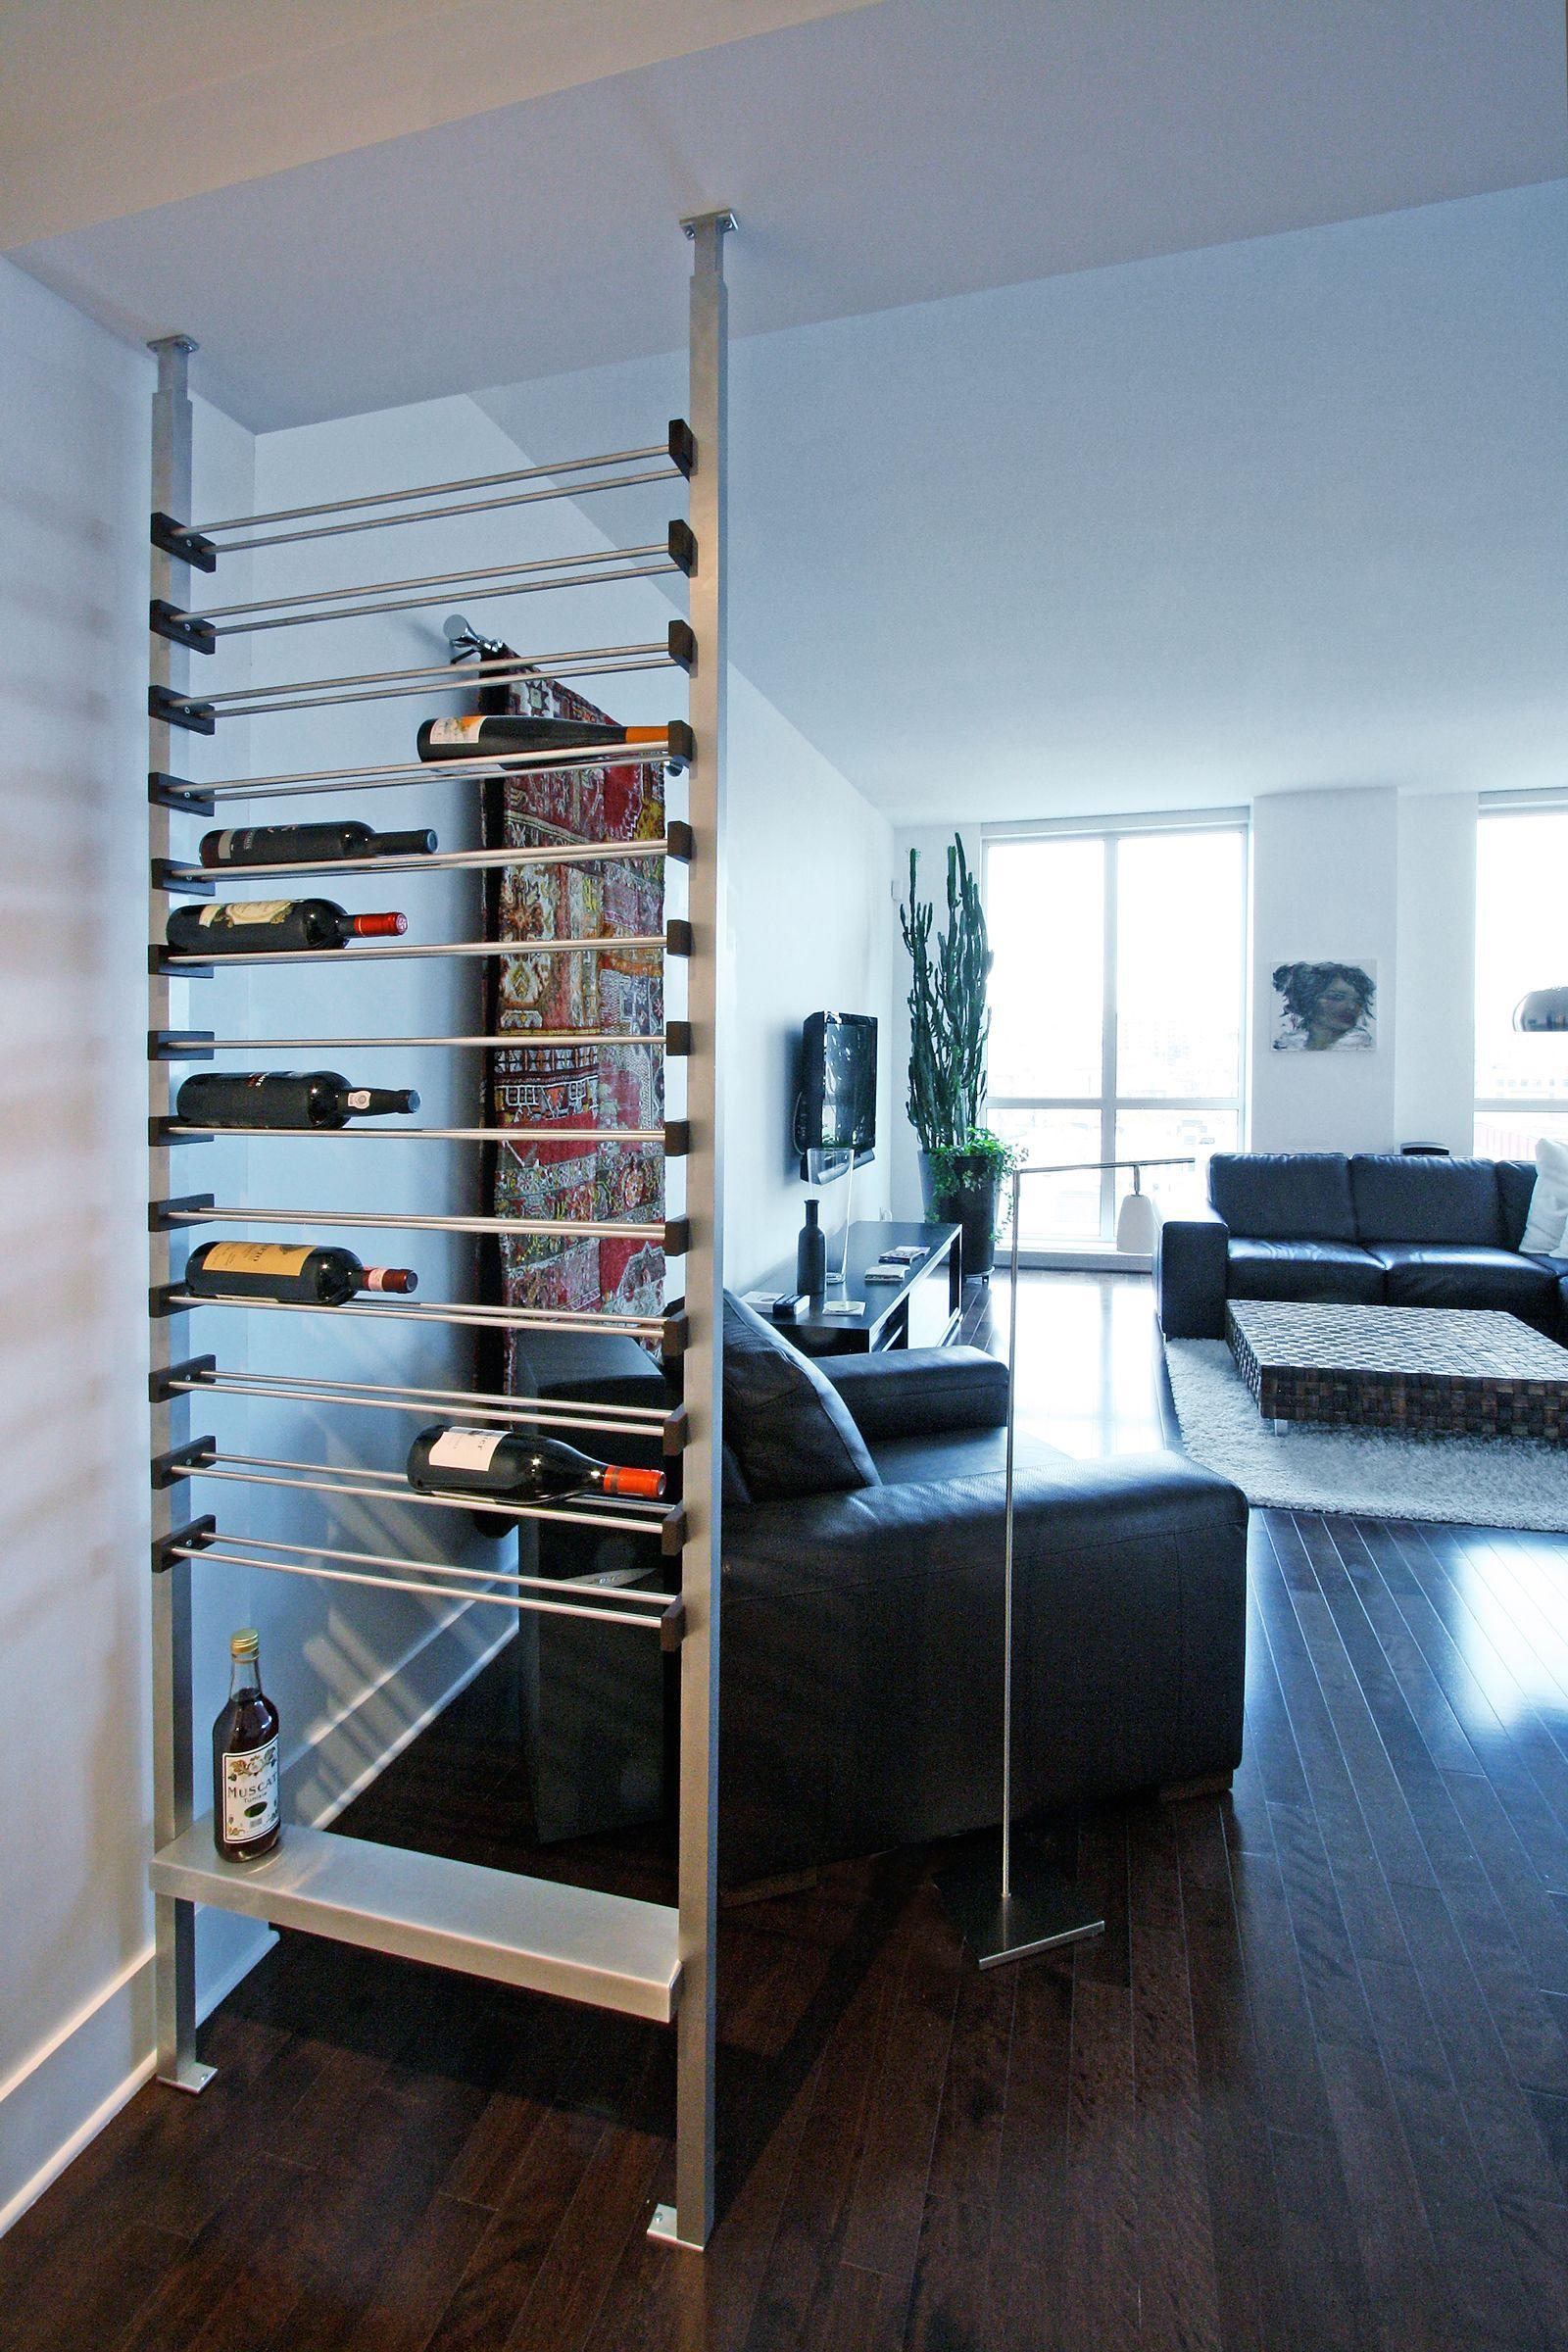 IMG2056 | Kitchen lighting | Pinterest | Contemporary style, Wine ...